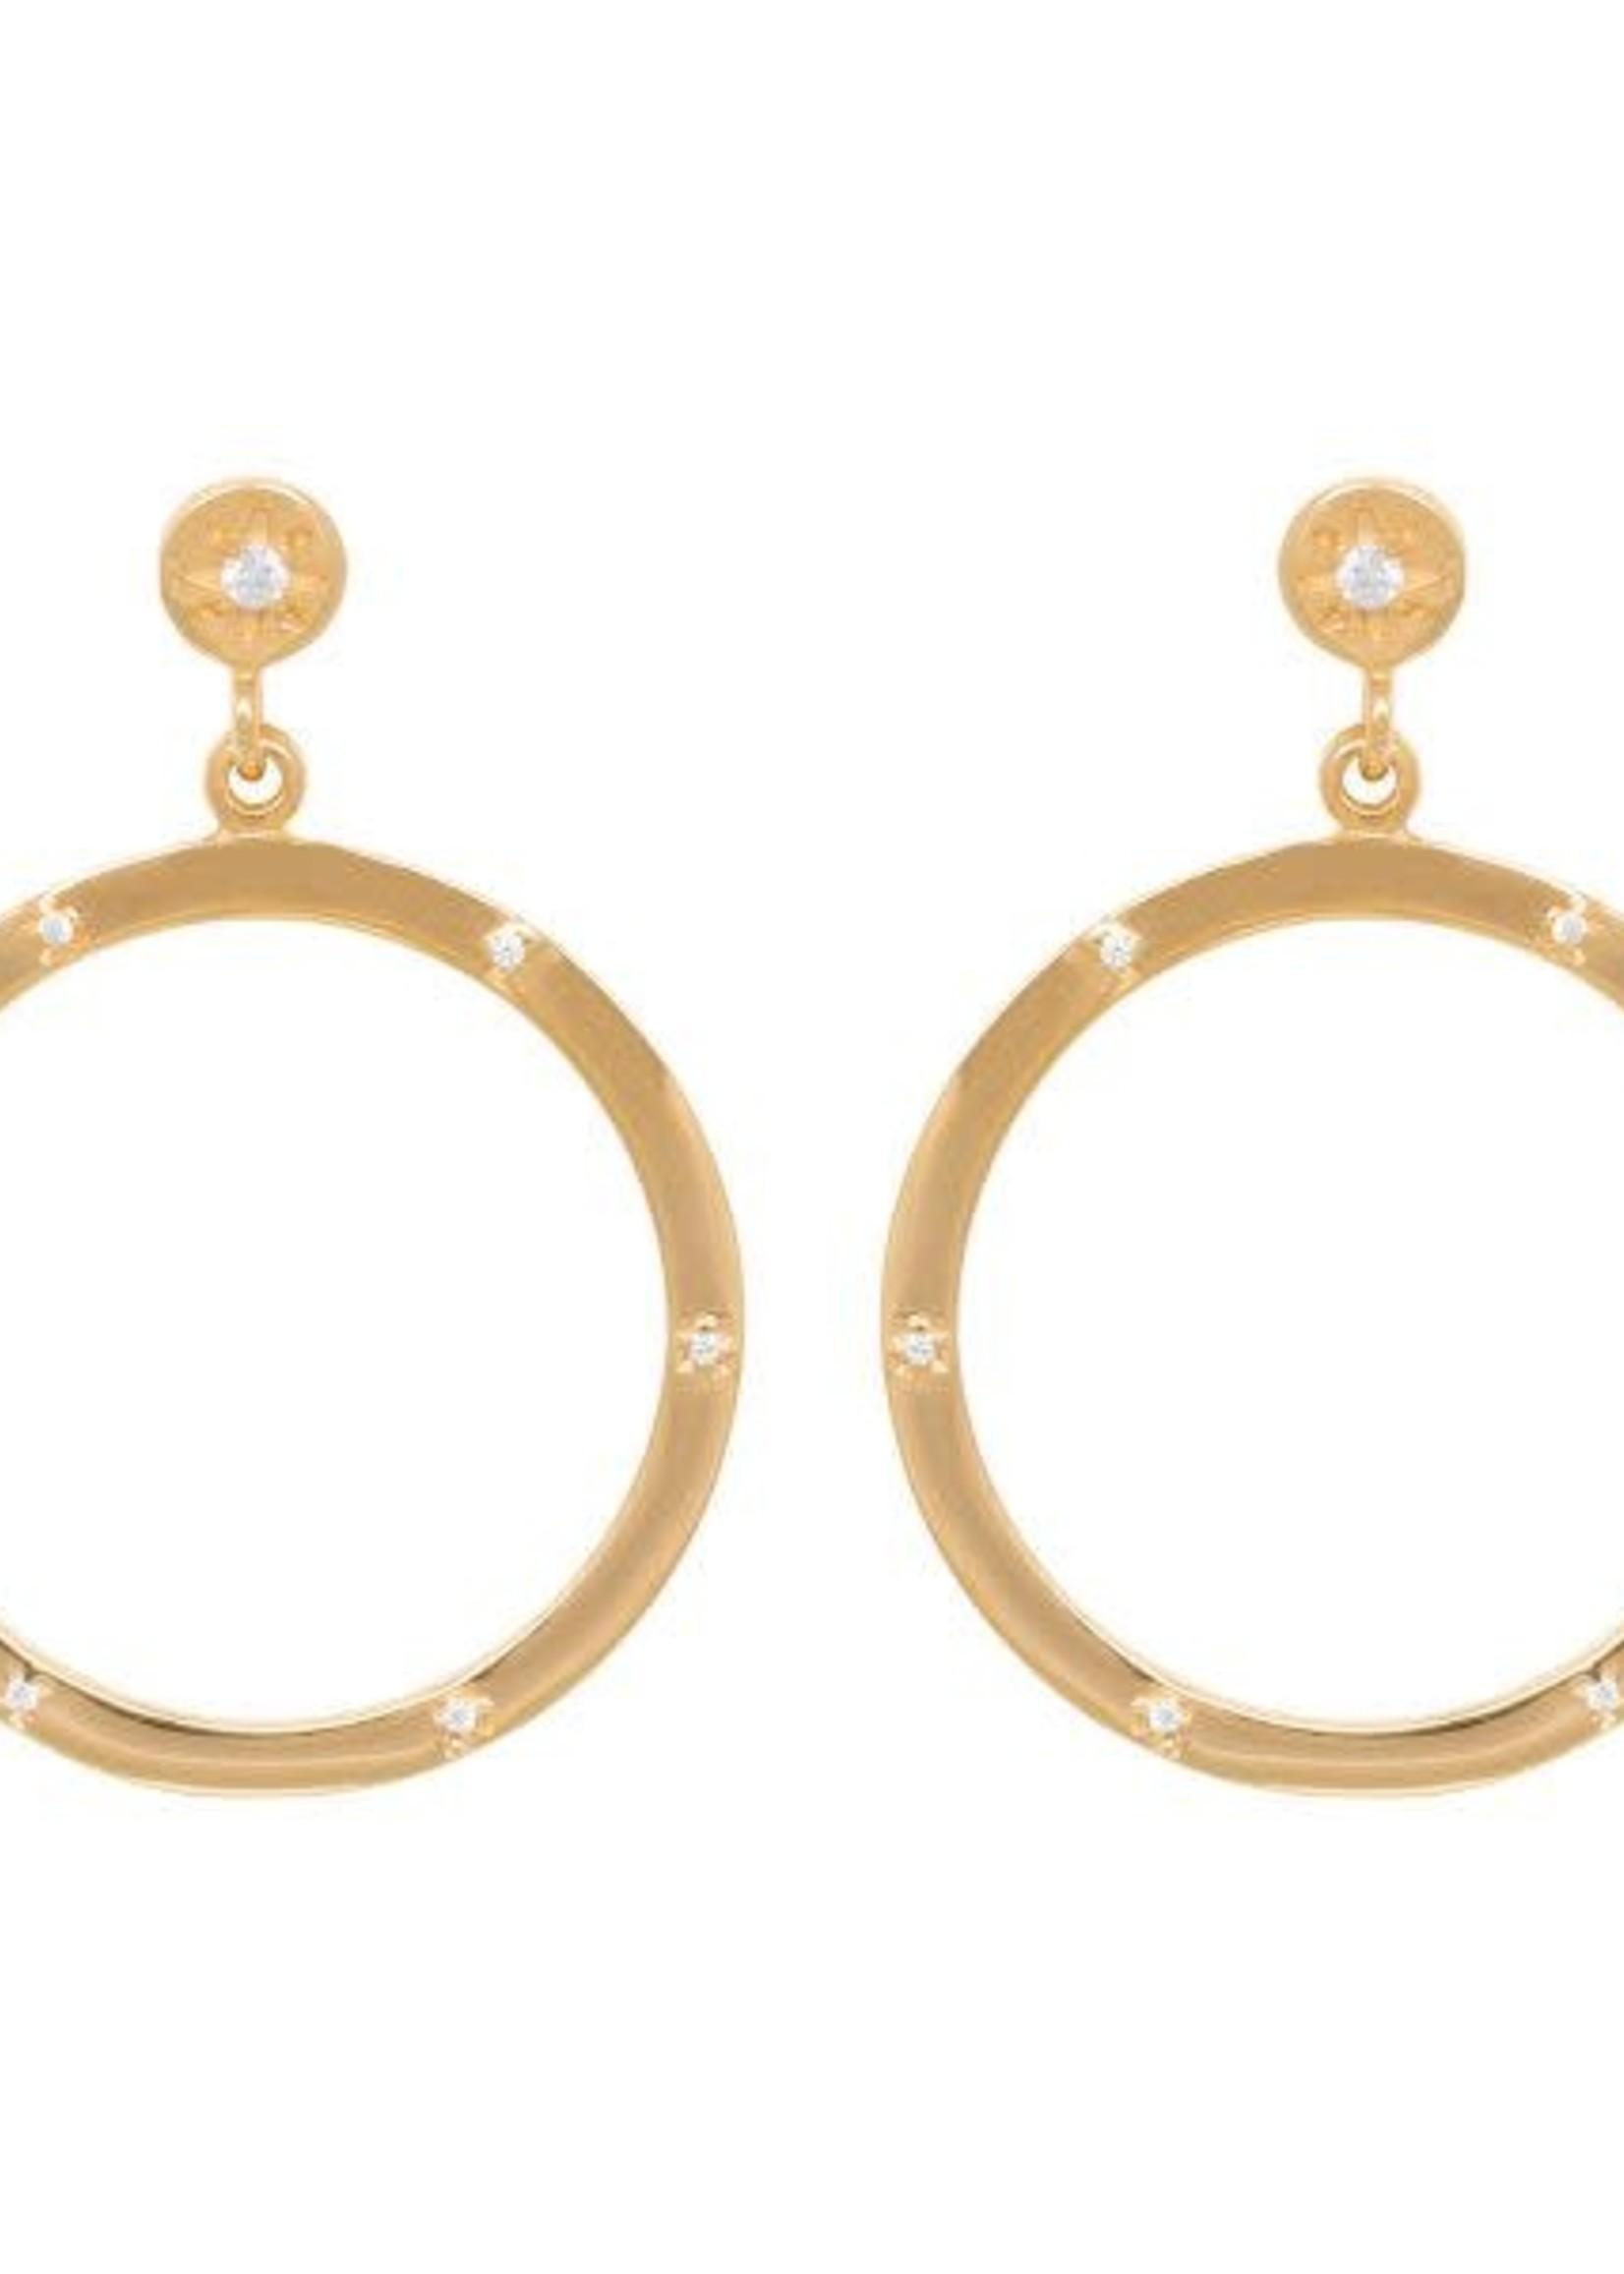 Eline Rosina  Zirconia Dotted hoop earrings in gold plated